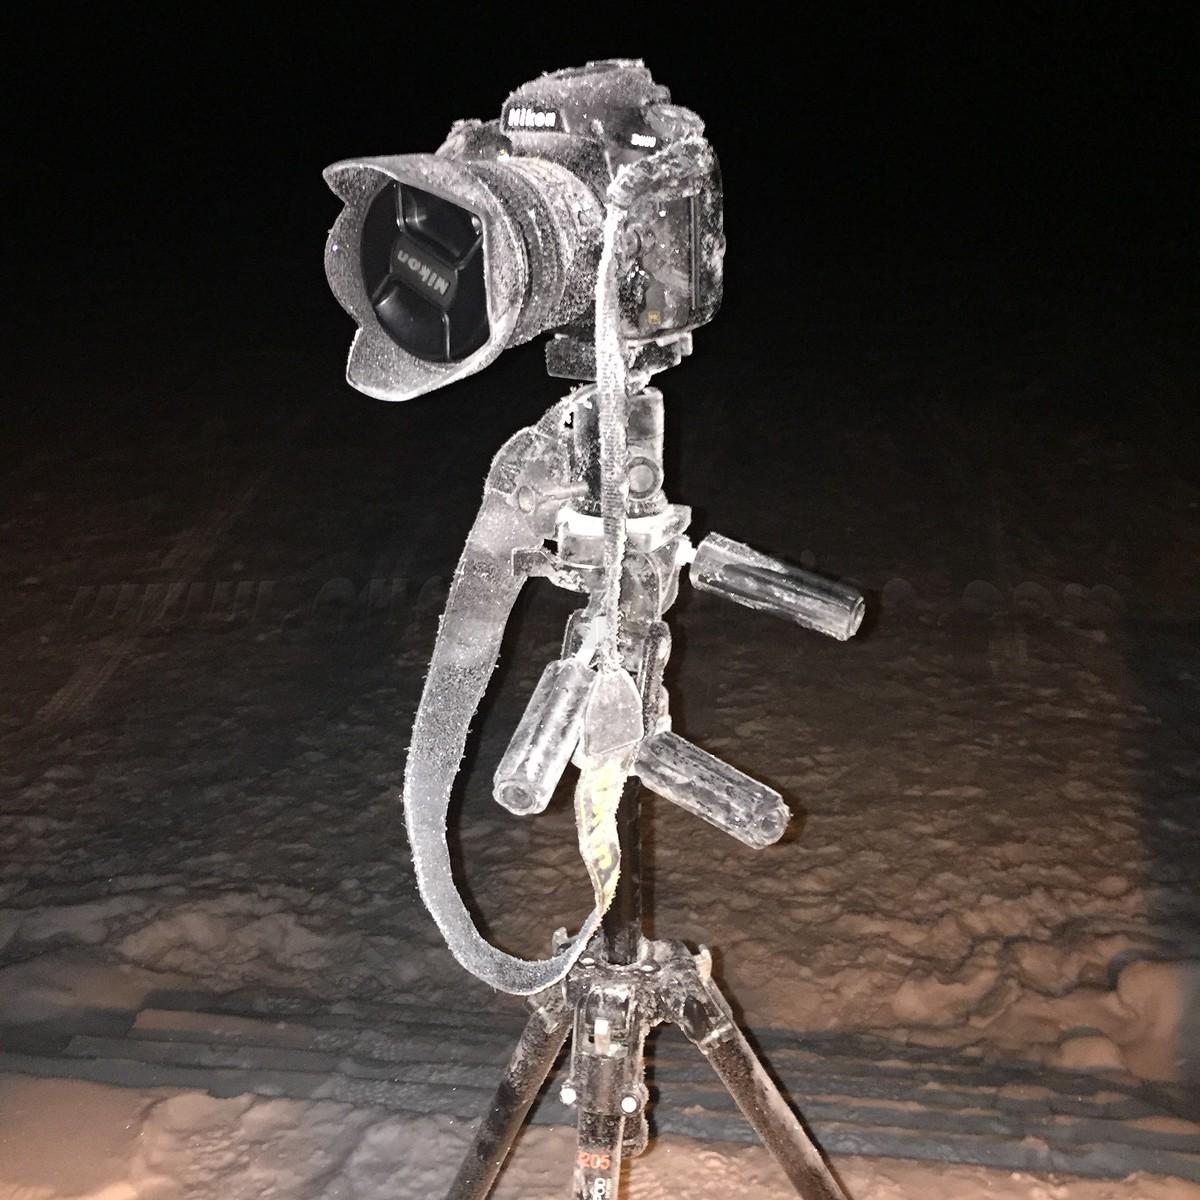 Lens warmers anyone?